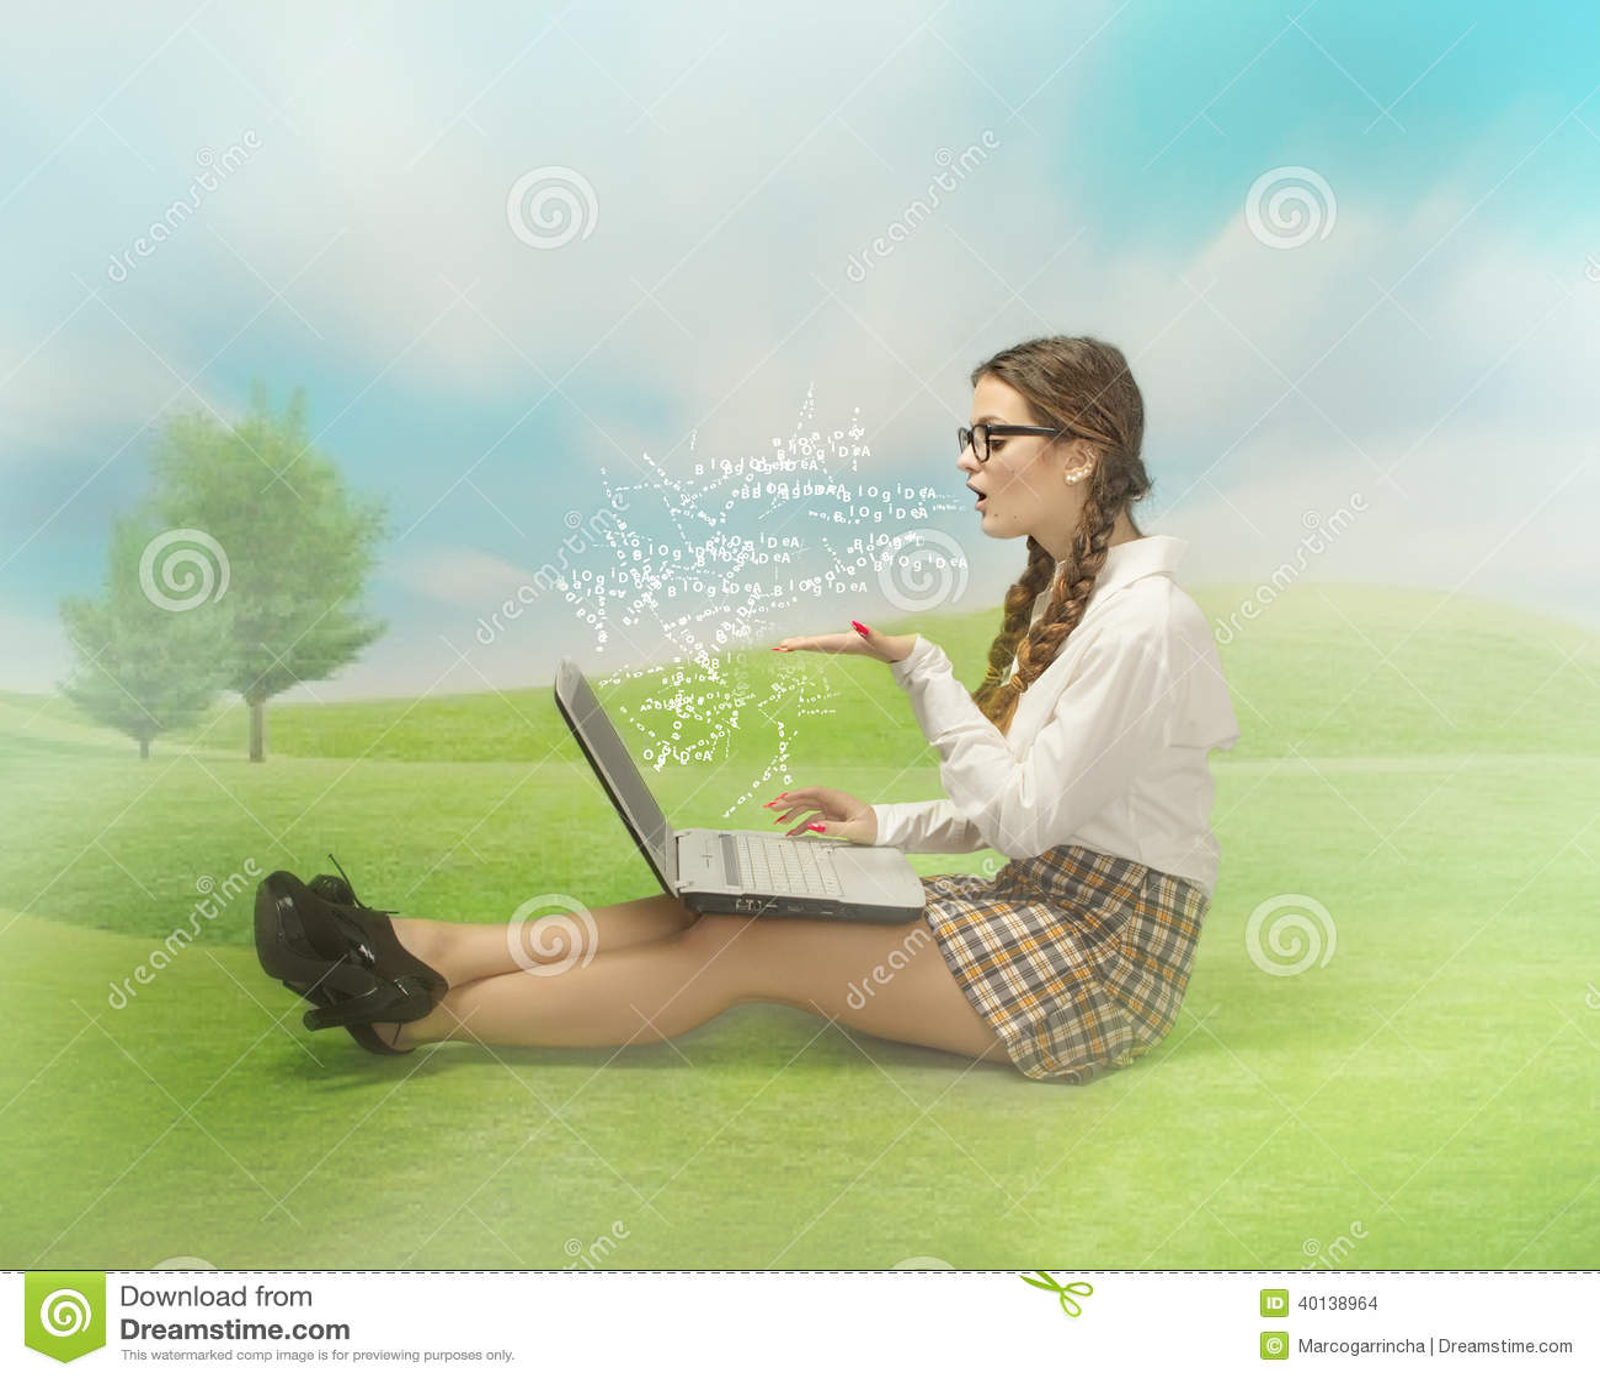 Nerd girl blogging in an outdoor place